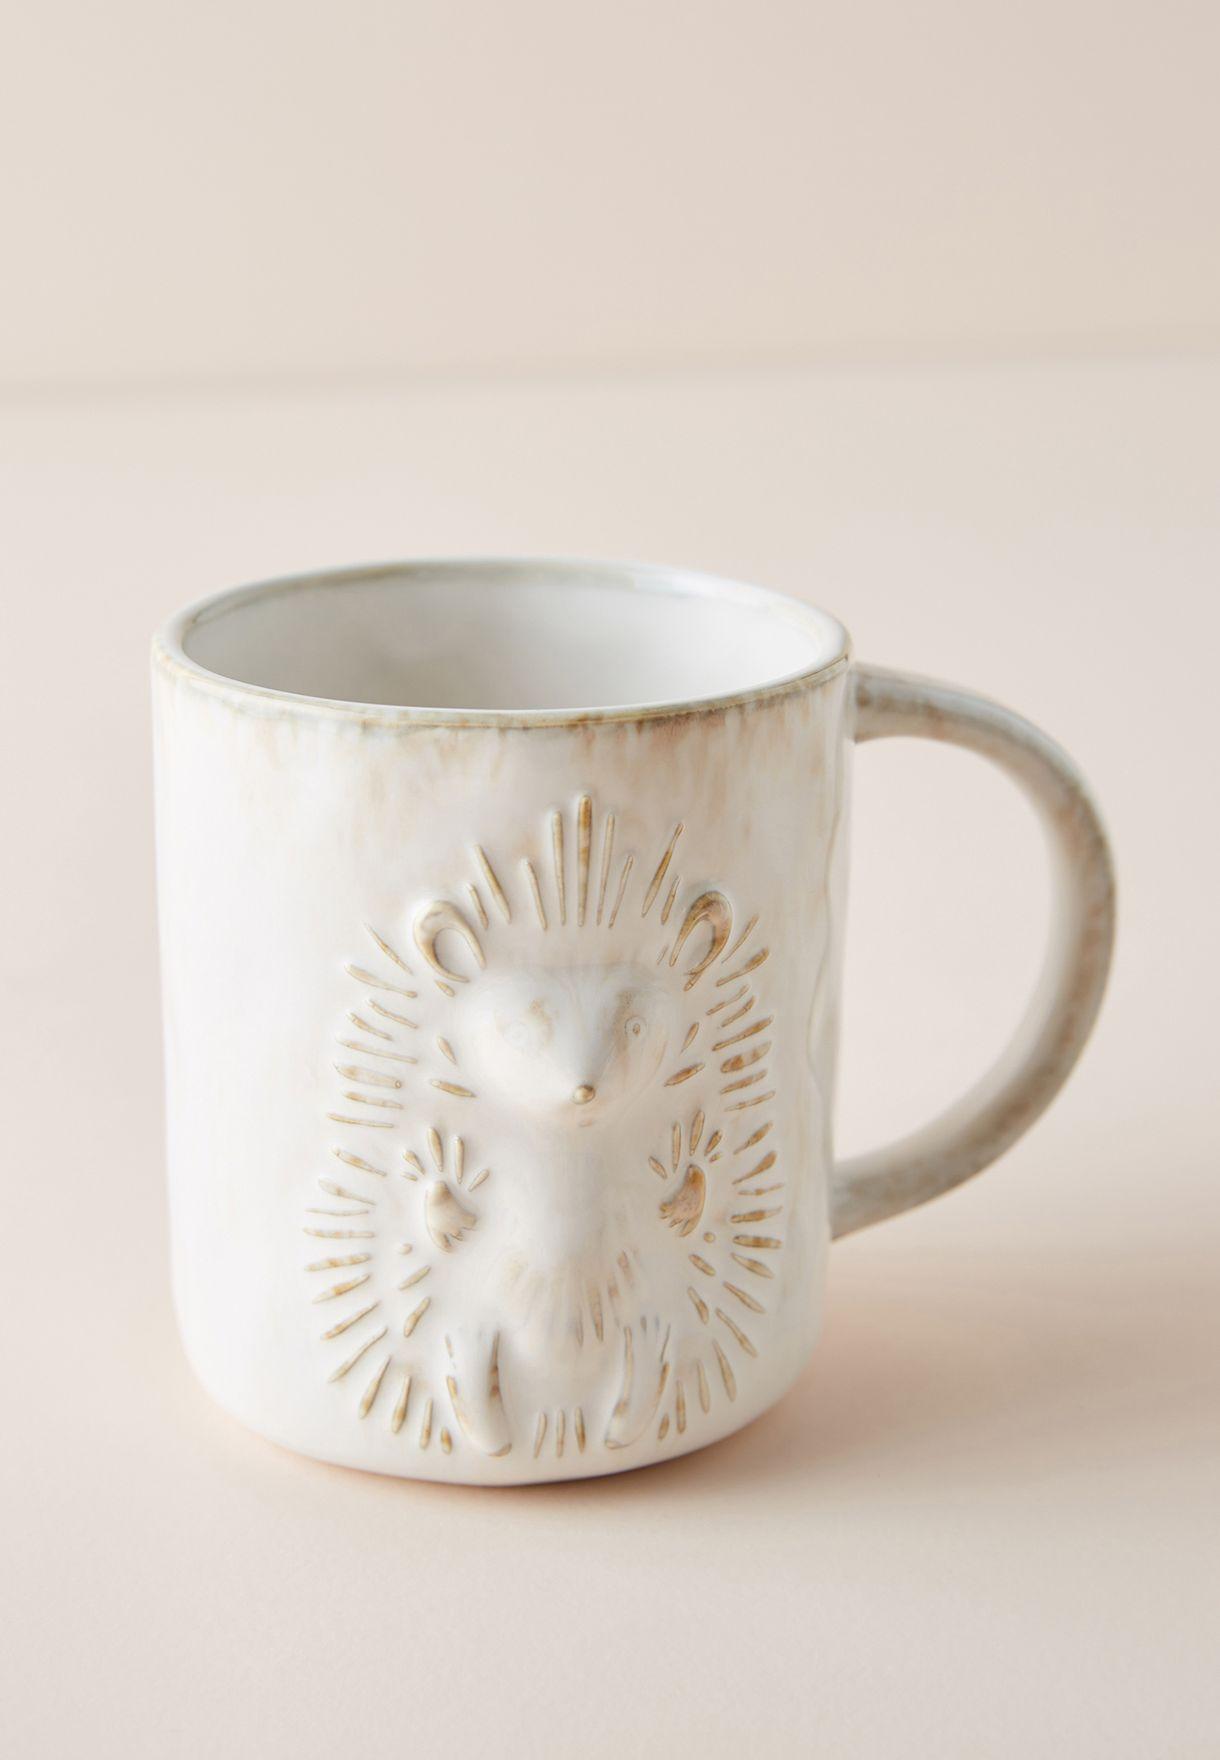 Hedgehog Kylo Mug